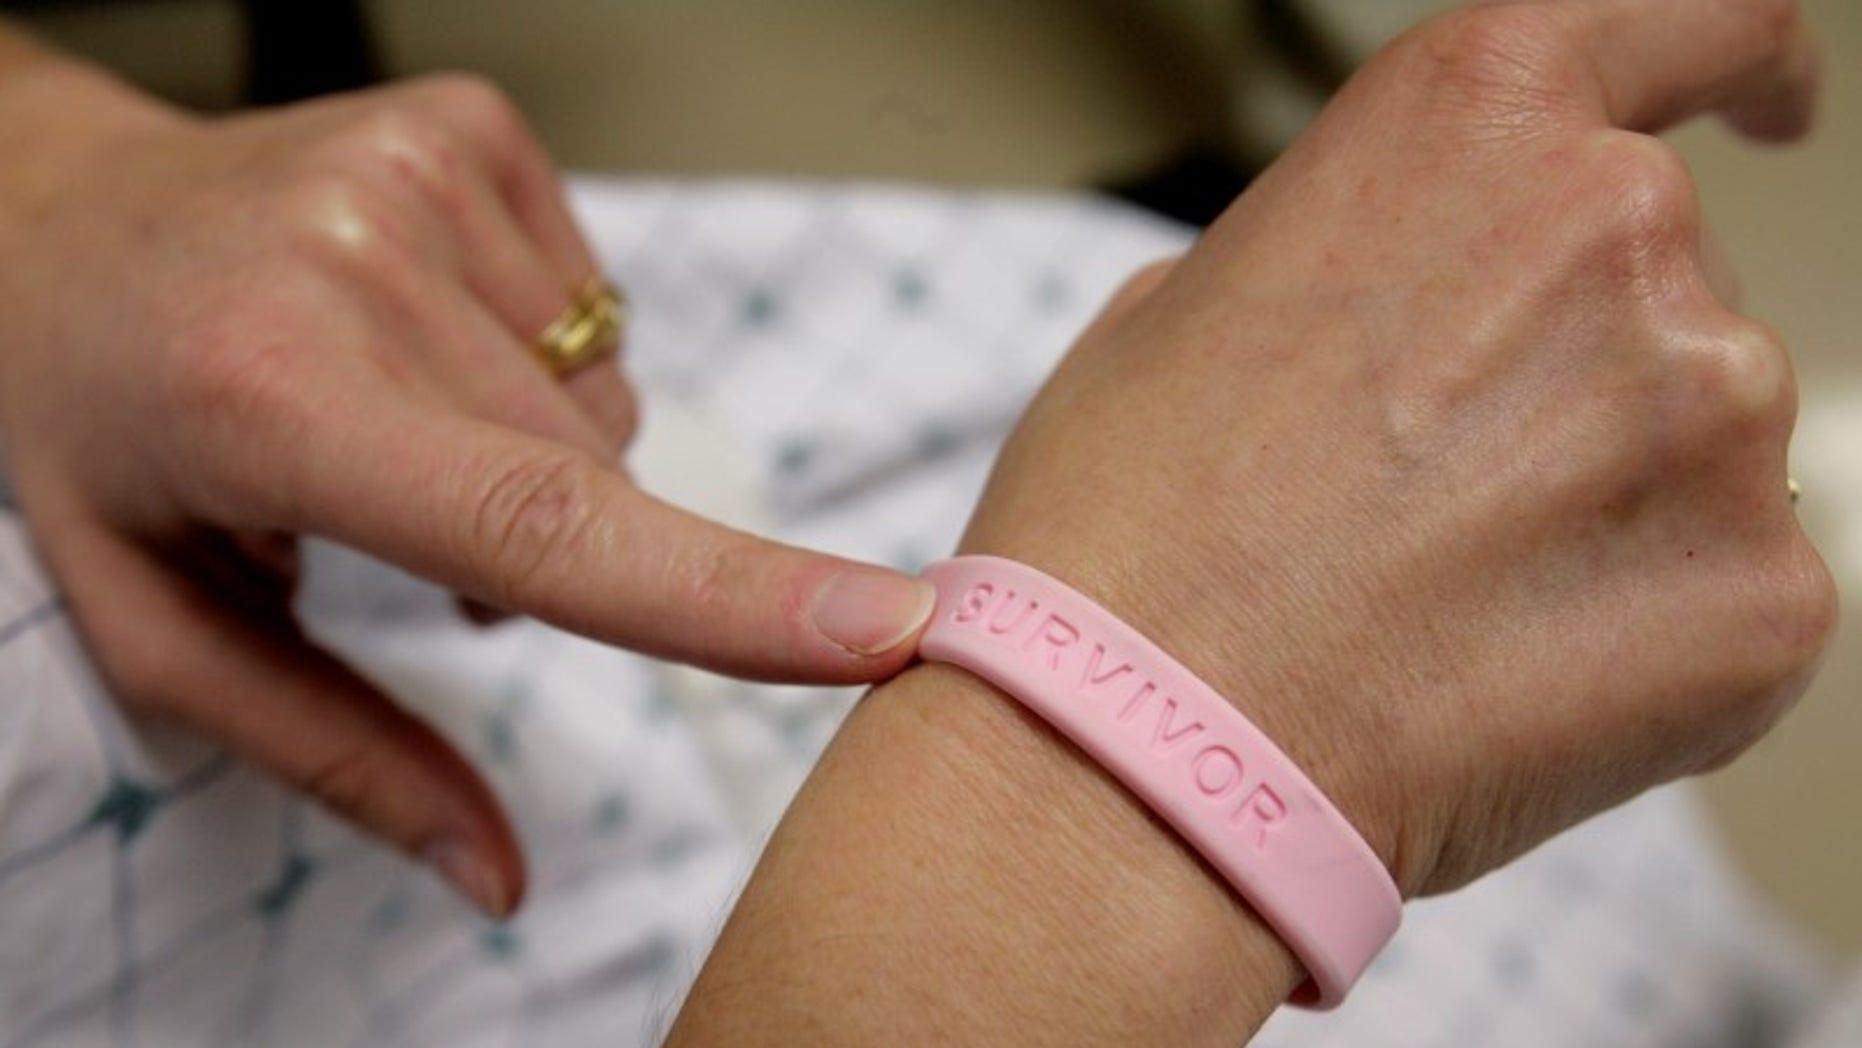 A cancer patient shows off her breast cancer survivor bracelet REUTERS/Jim Bourg